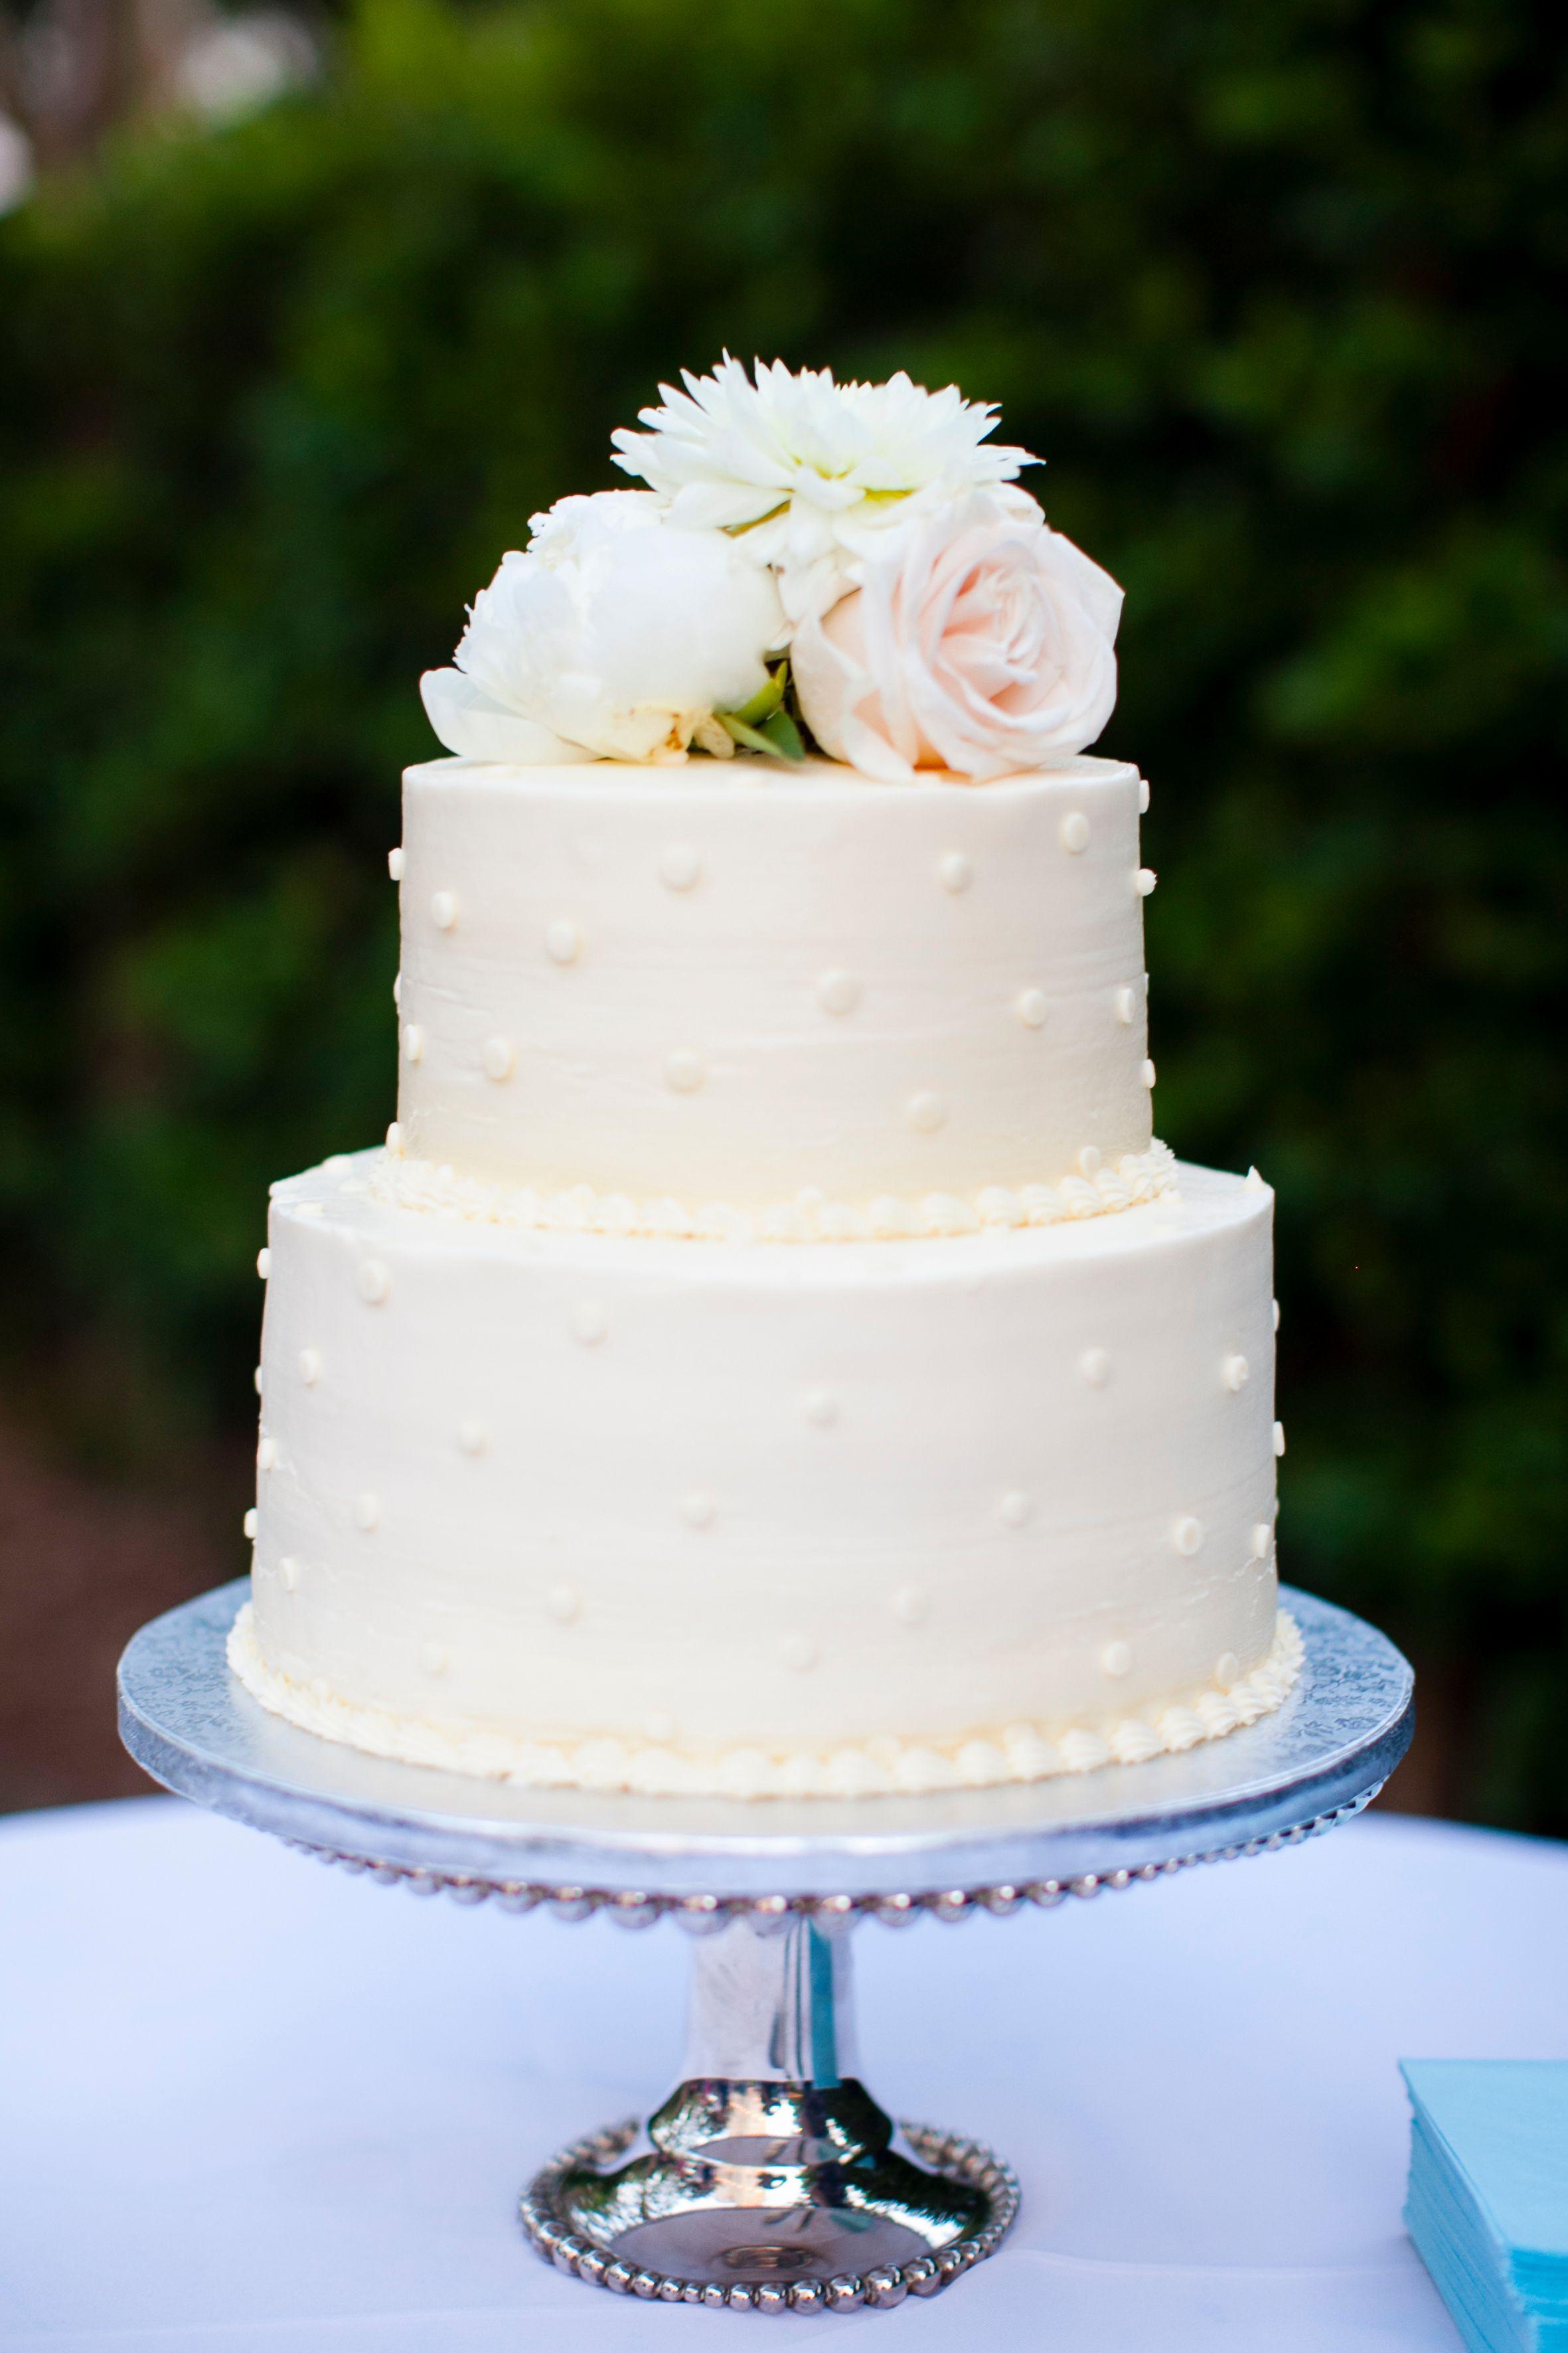 Two Tier Polka Dot Buttercream Wedding Cake Wedding Cake Designs Buttercream Simple Wedding Cake Wedding Cake Designs Simple